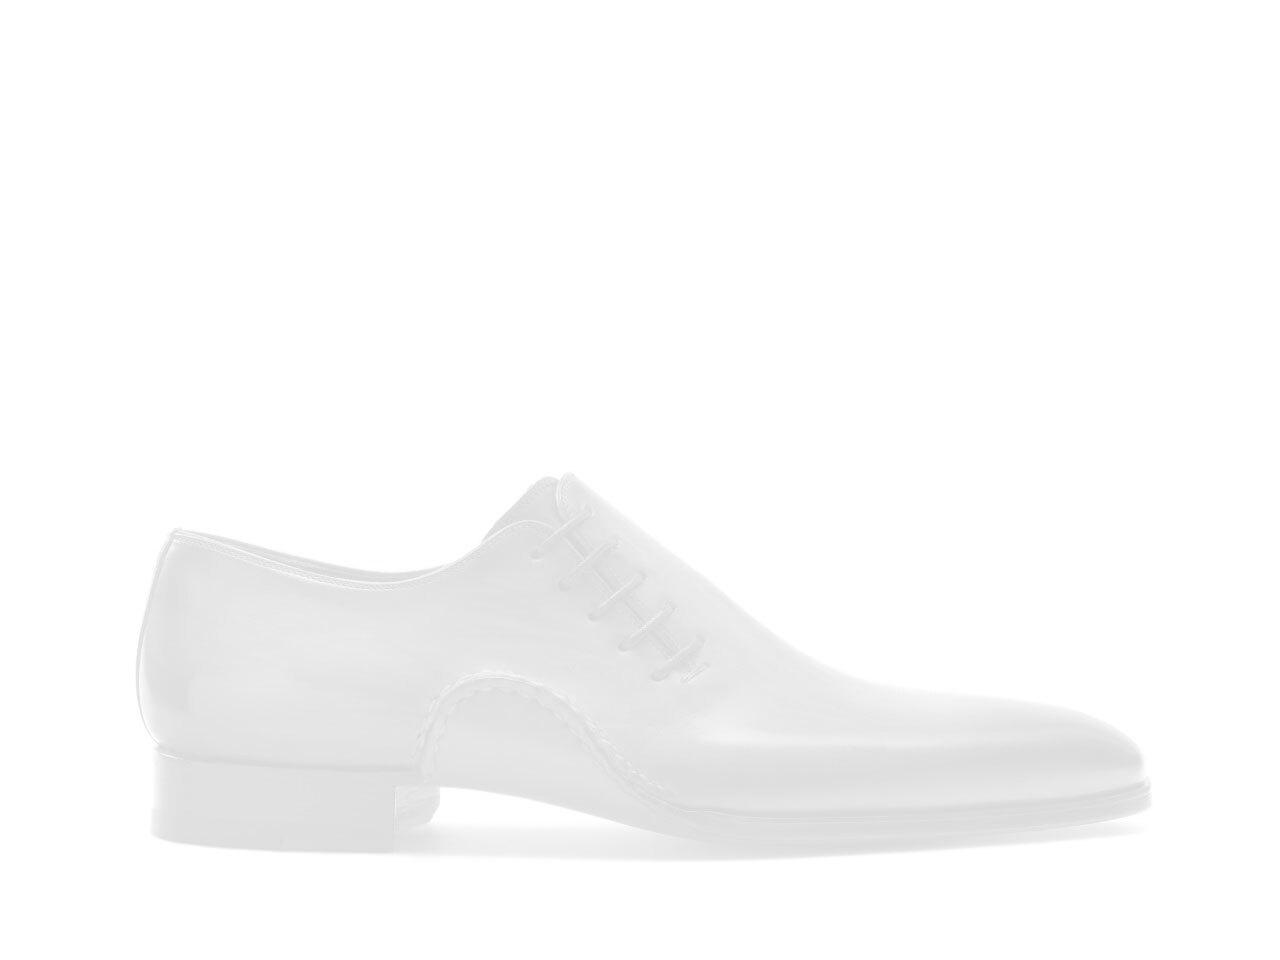 Beige business casual socks - Magnanni